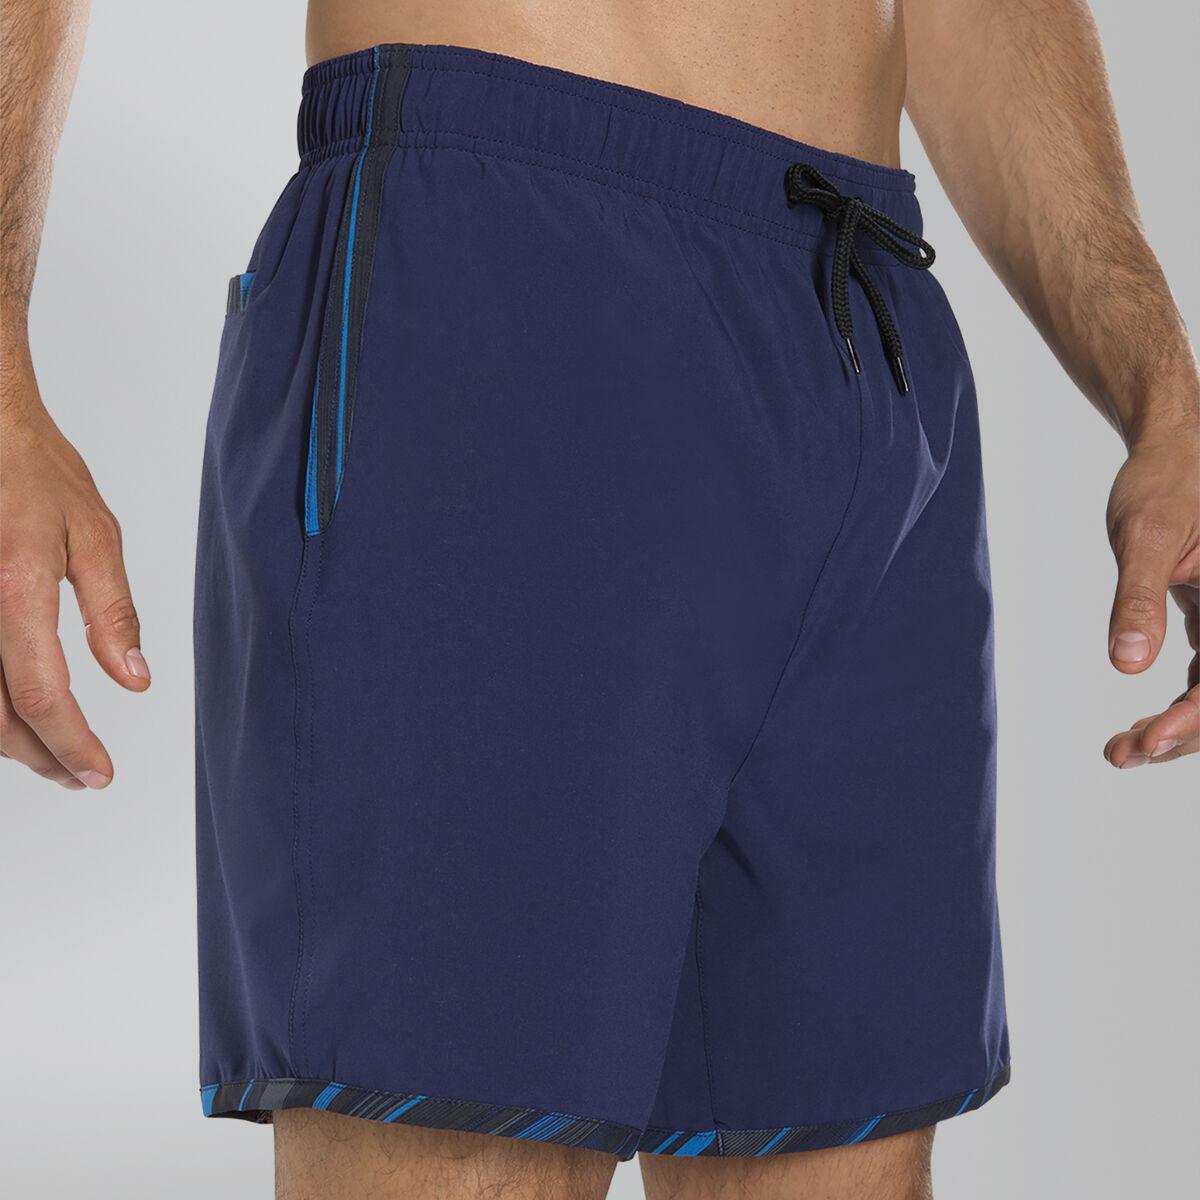 "Glide Trim 16"" Swim Shorts"